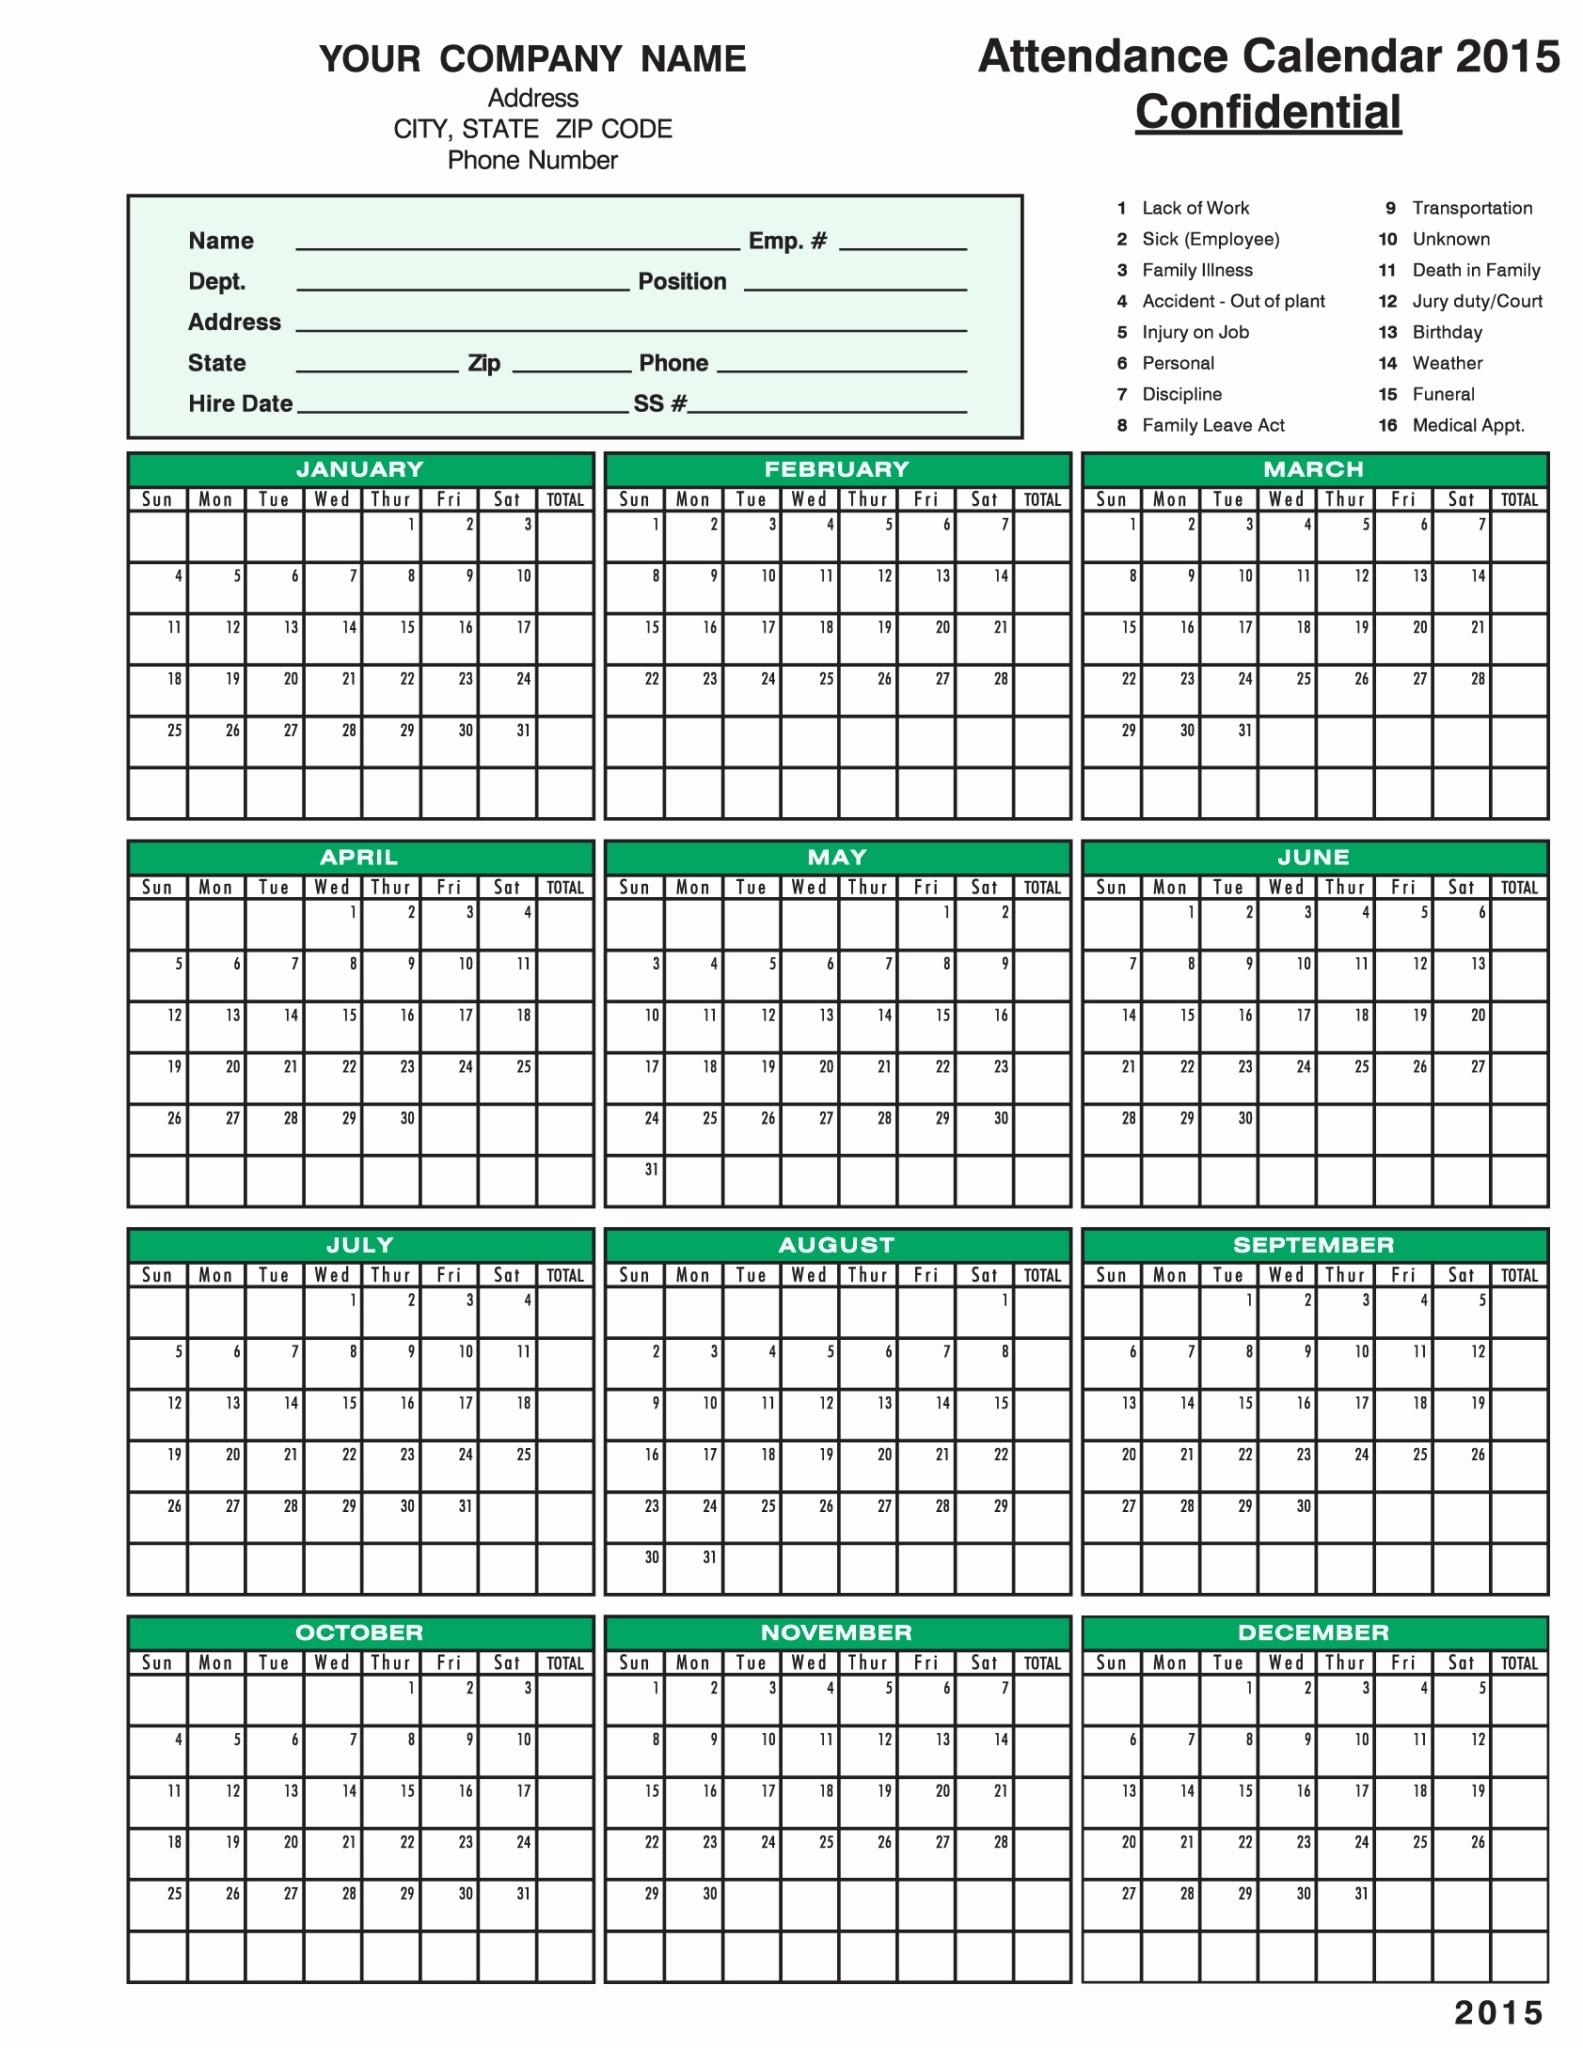 Free Printable Employee Attendance Calendar 2019 Attendance Calendar inside Free Printable Employee Attendance Calendars